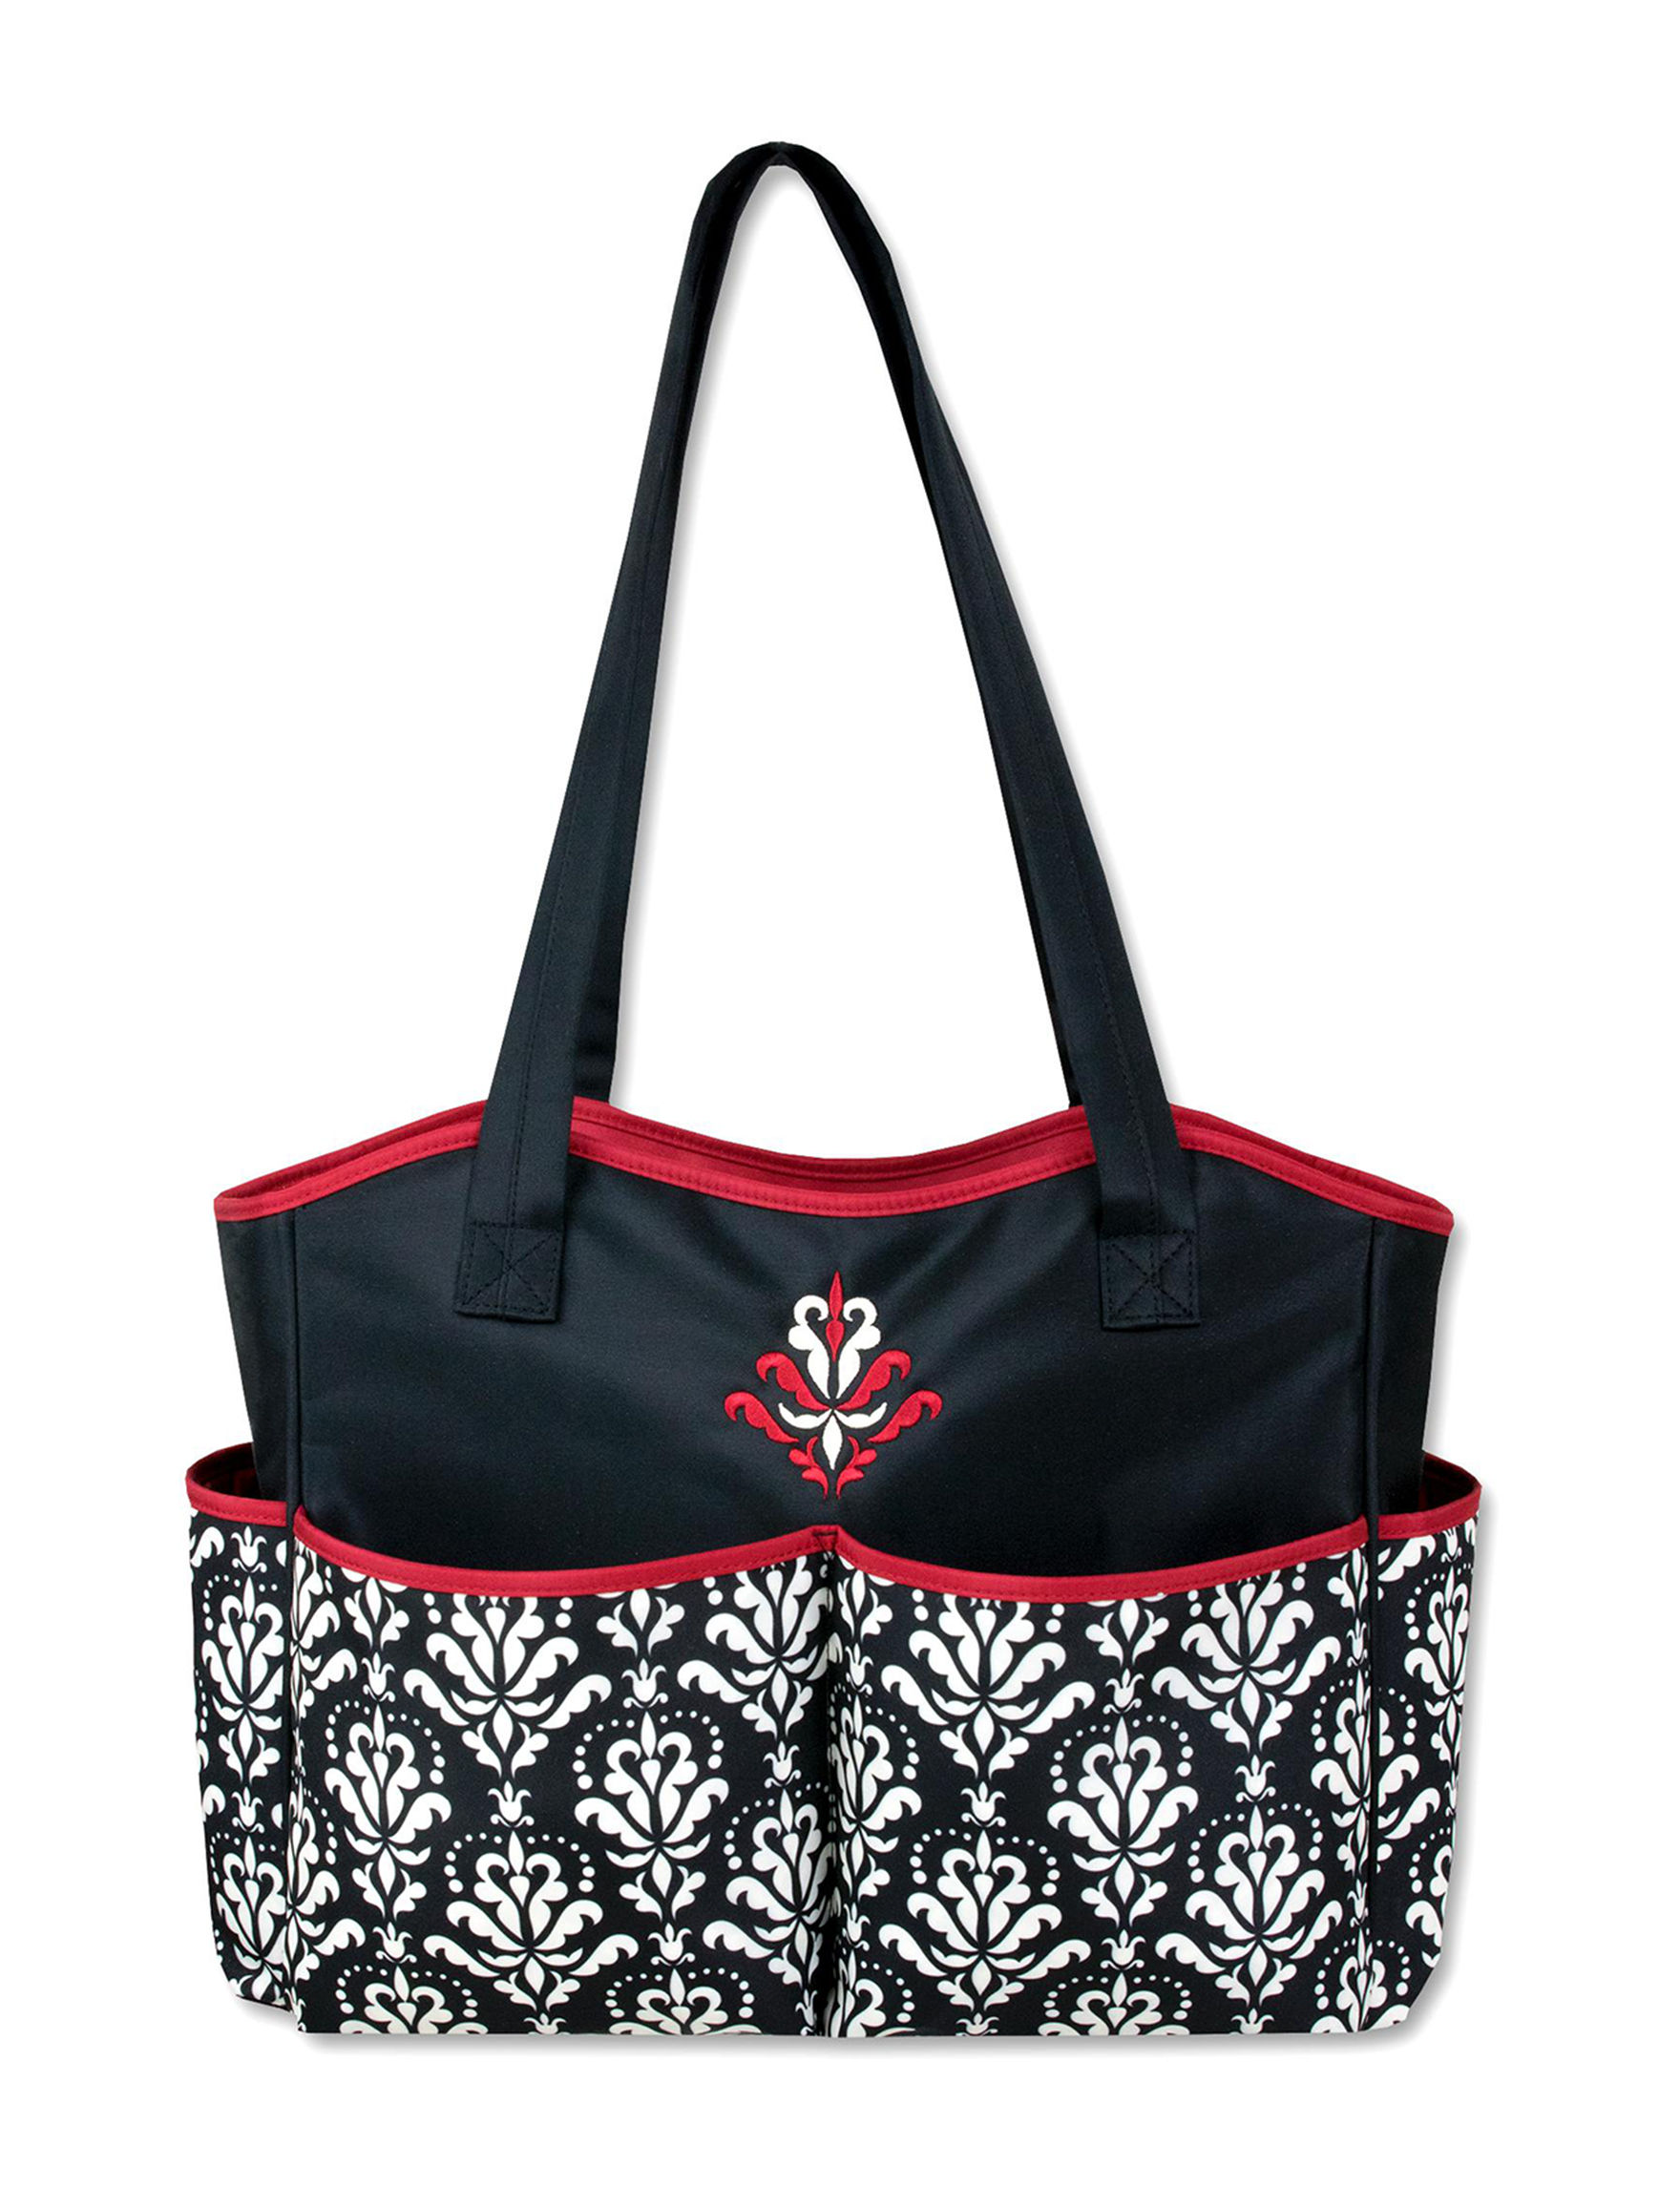 Baby Essentials Black /  White Diaper Bags